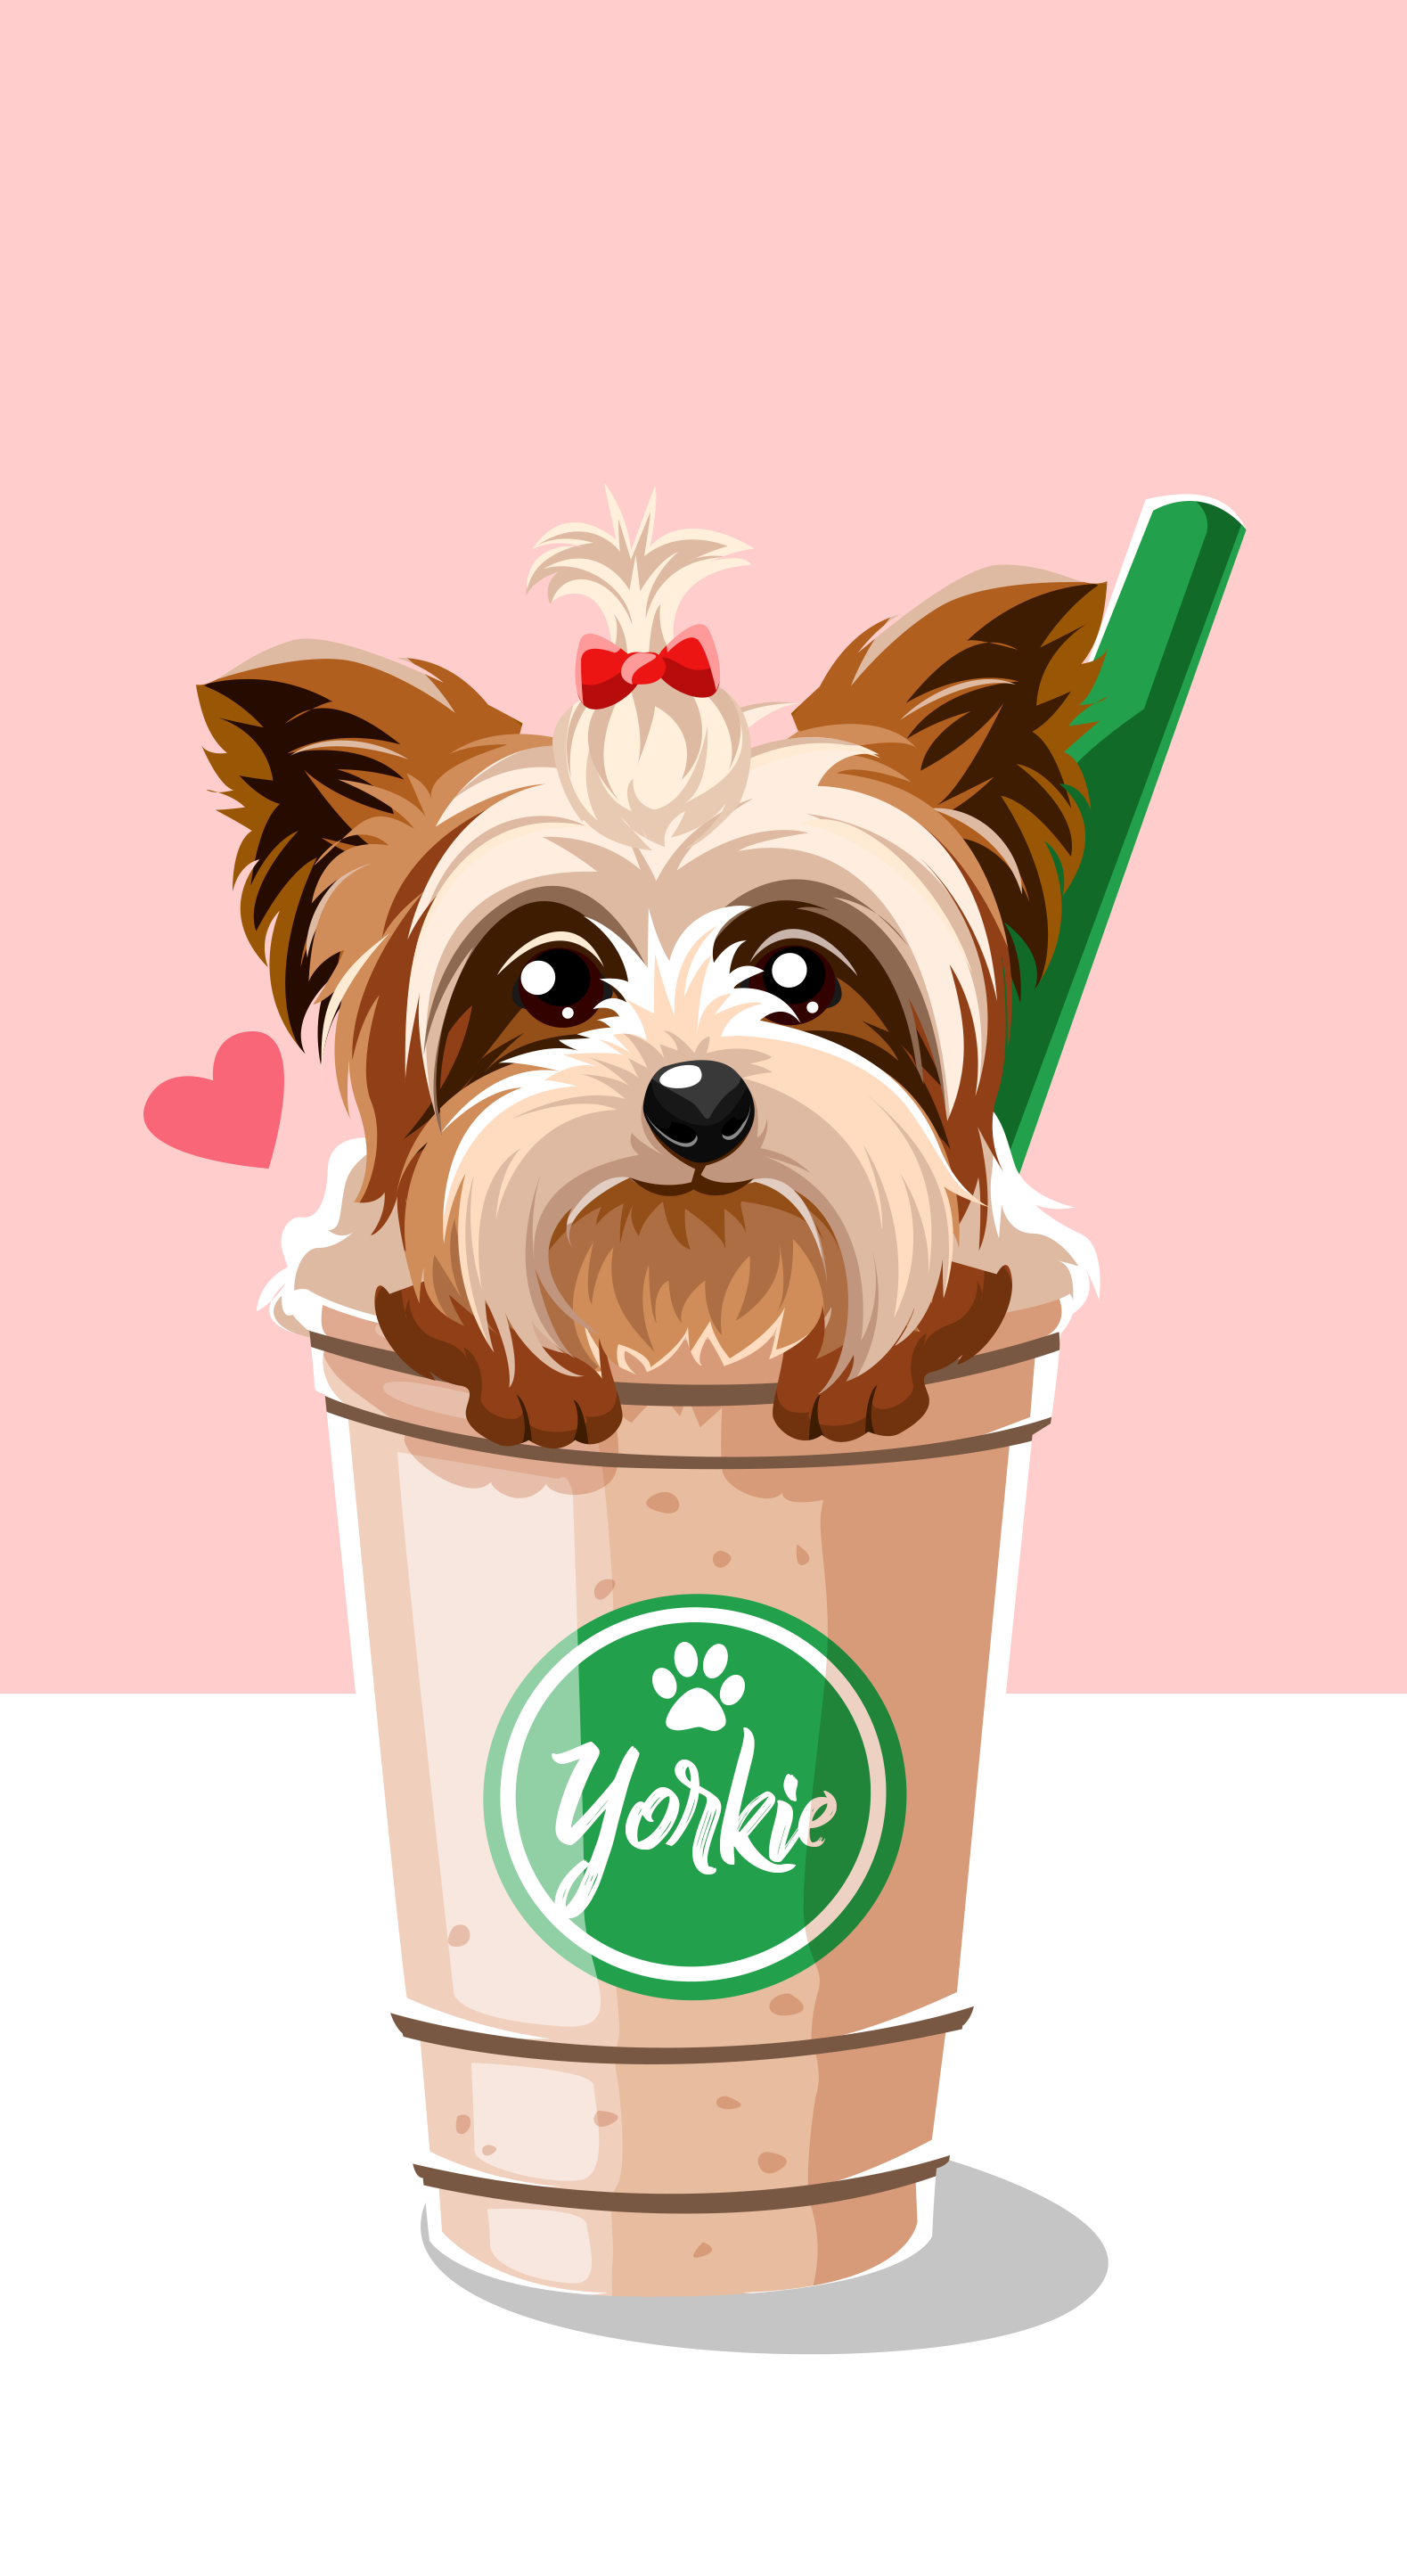 Wallpaper Cute Cartoon Drawings Dog Wallpaper Starbucks Wallpaper